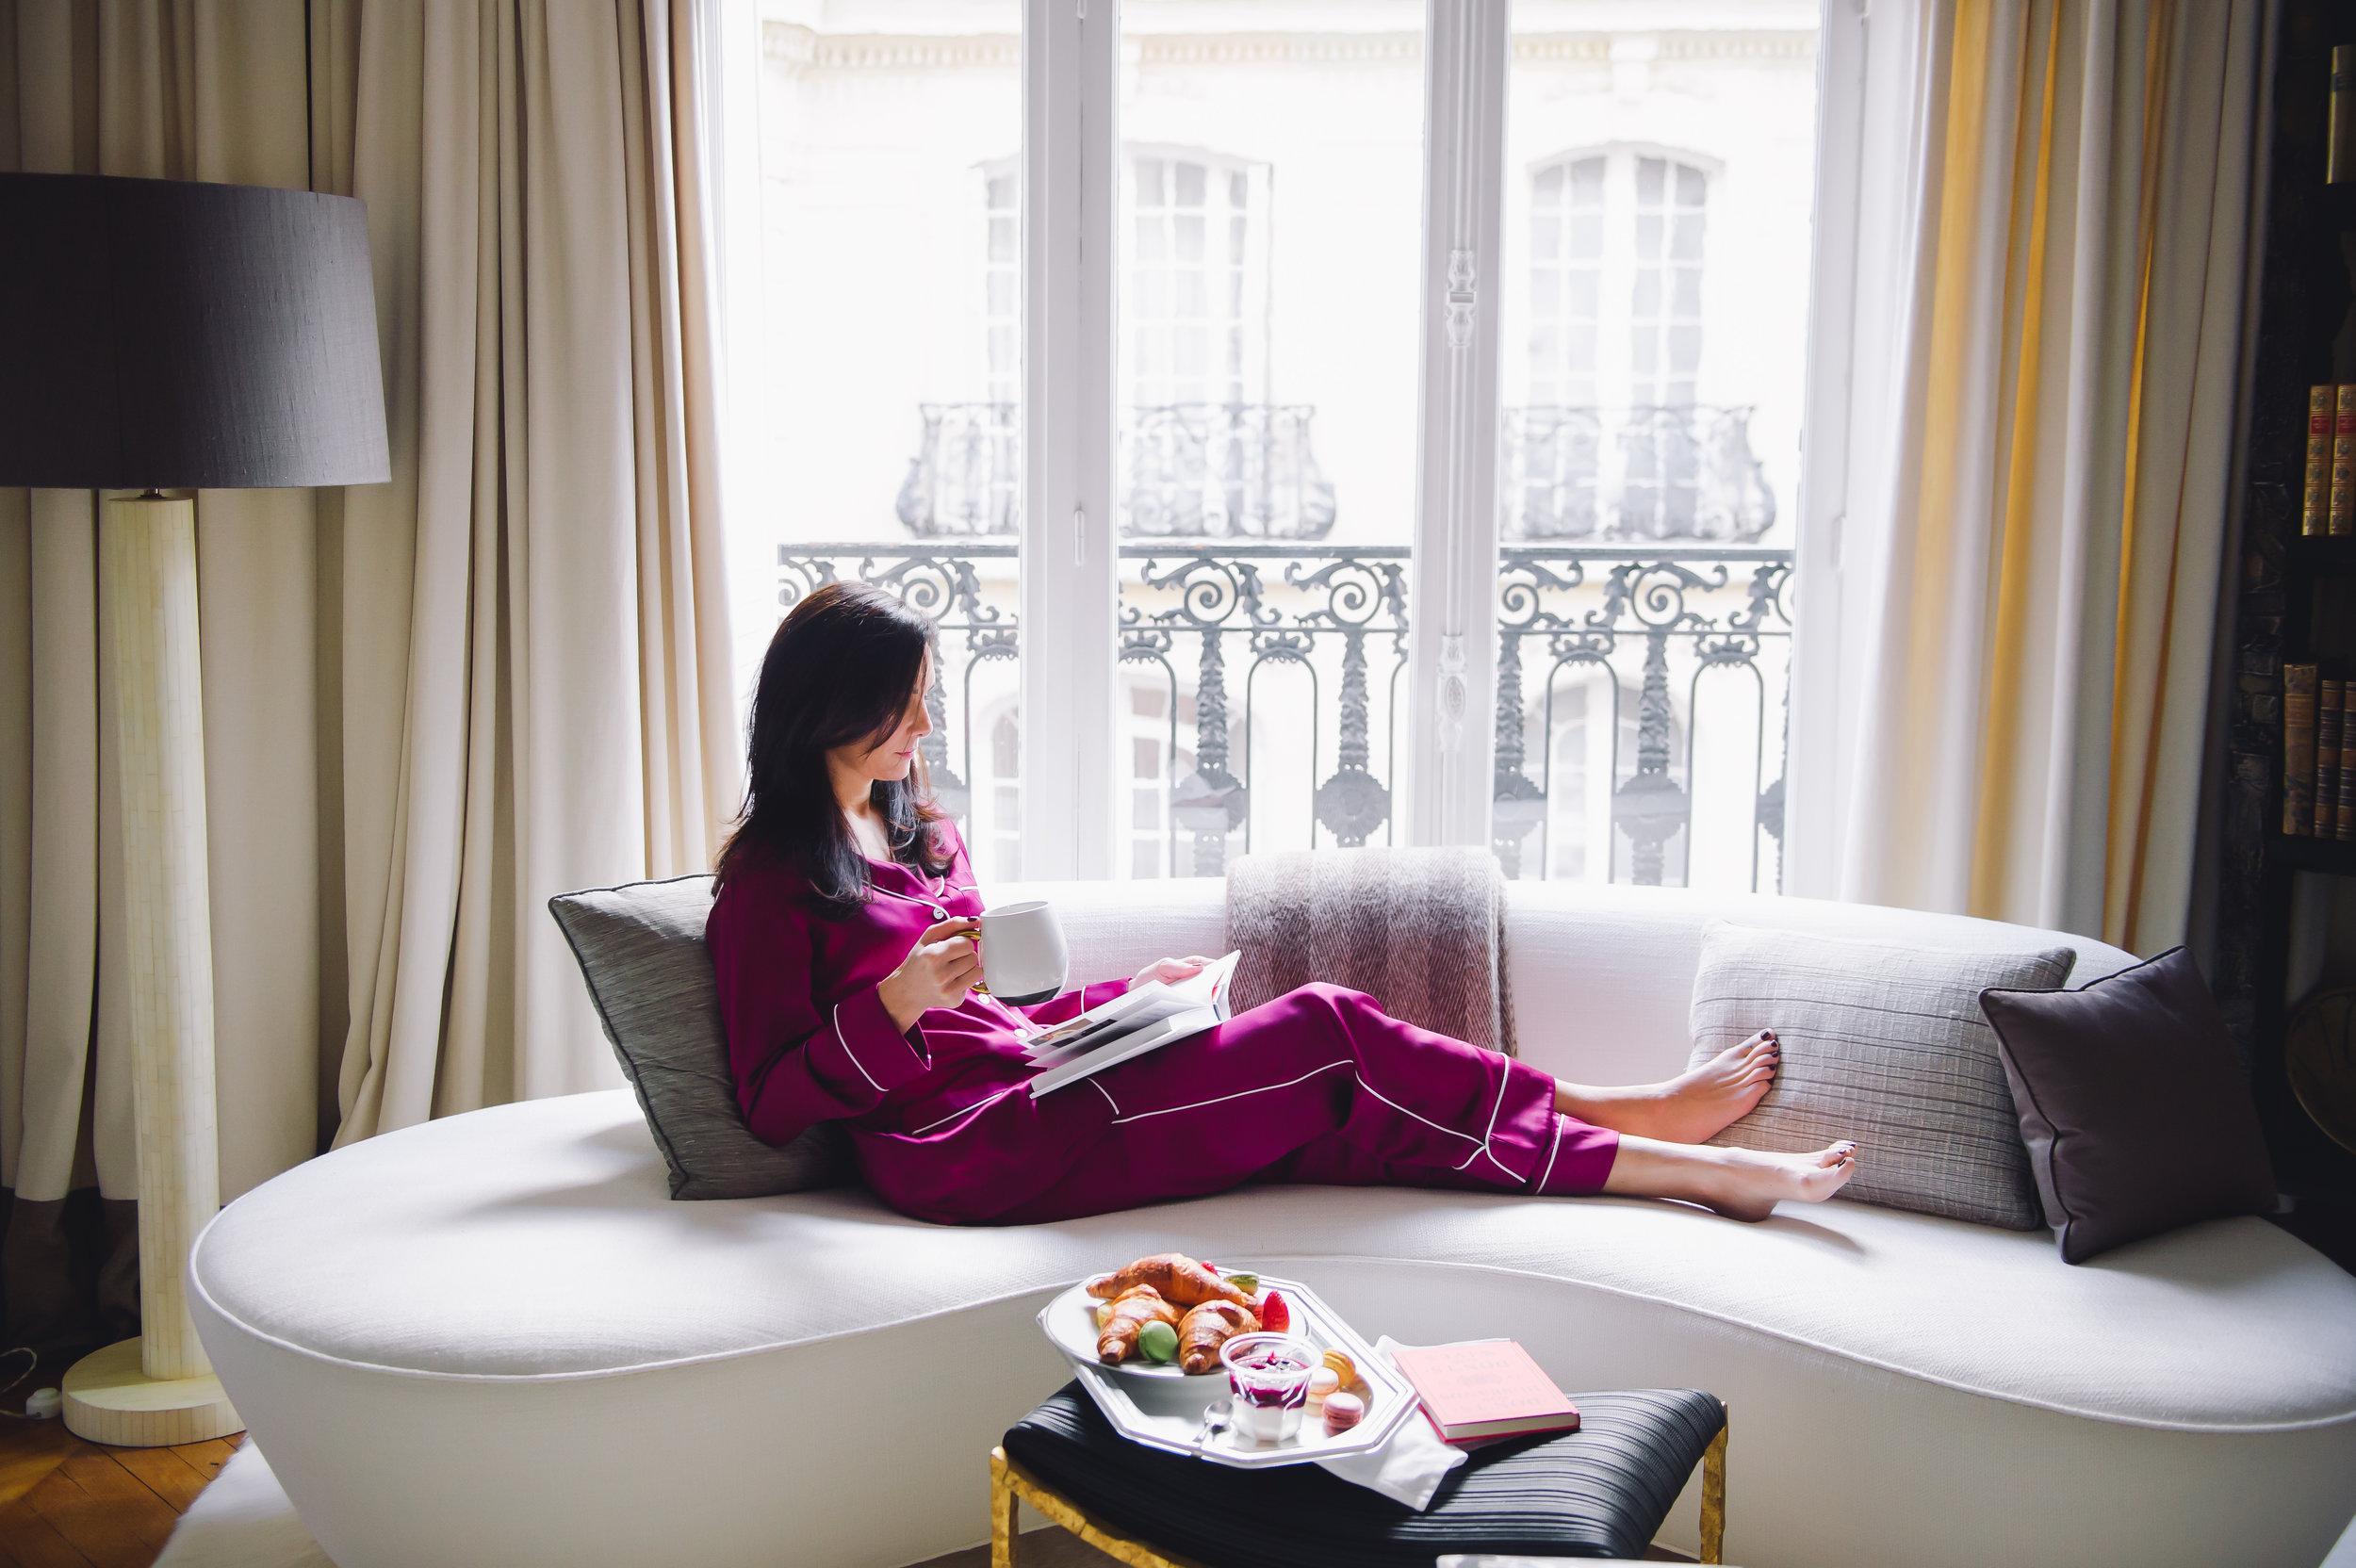 Elisabeth-Jones-Hennessy-Lingerie-Pajama-Paris-01.jpg